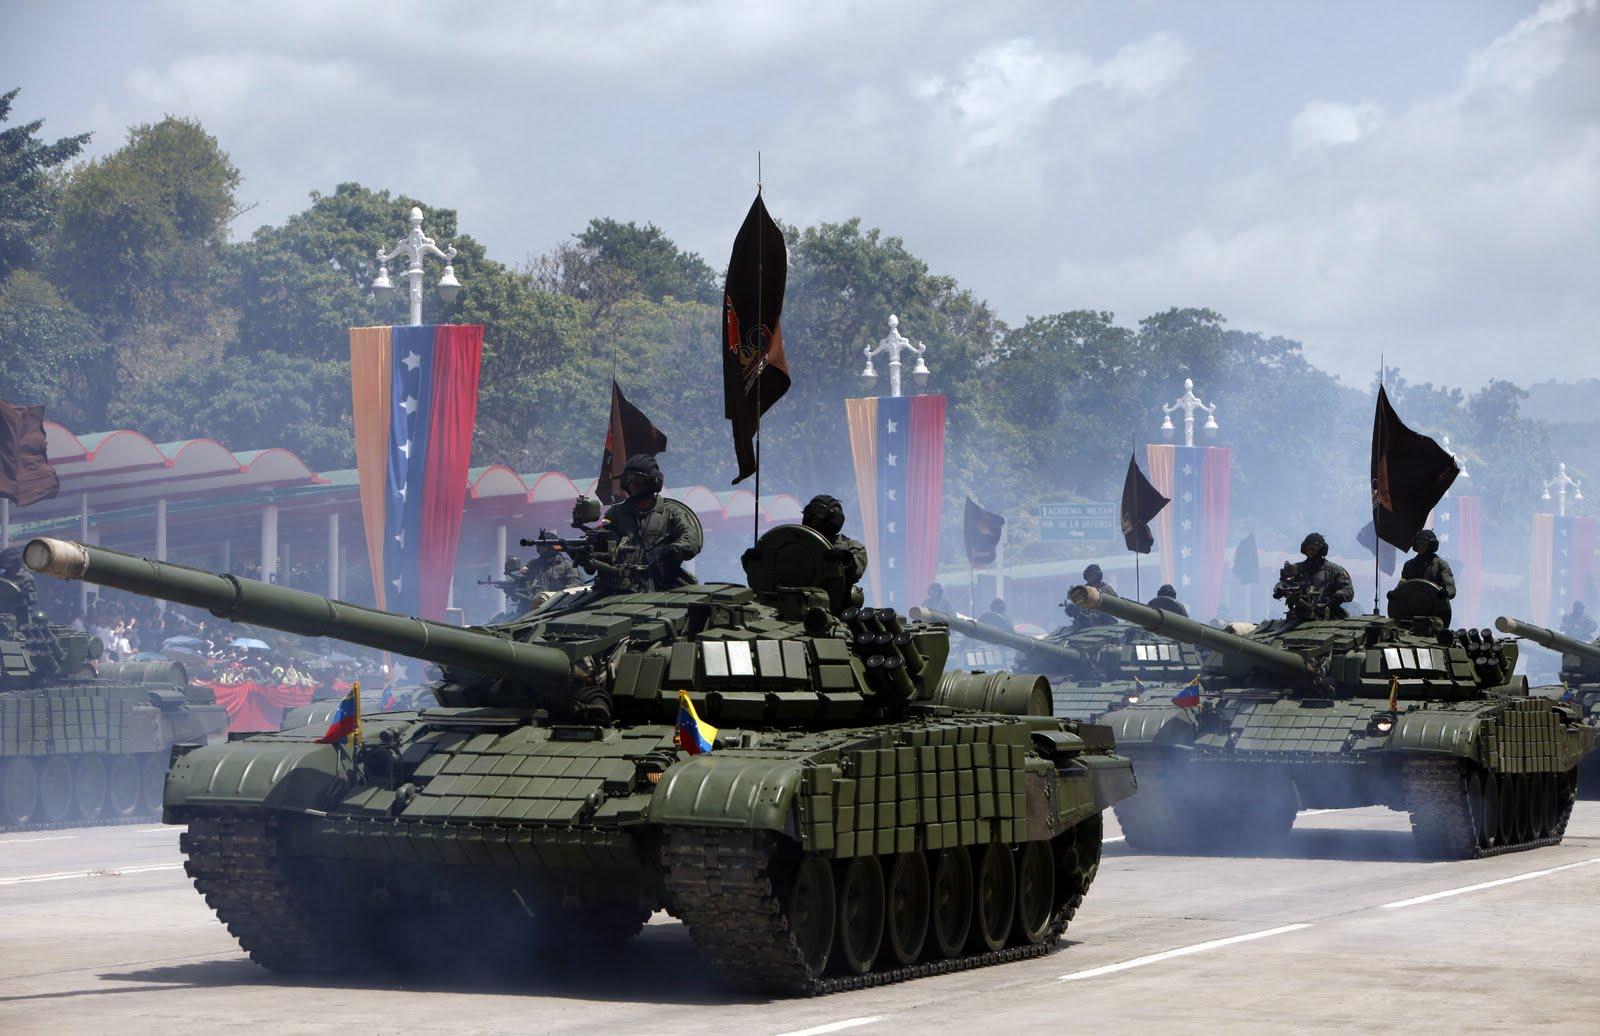 Crece Descontento Militar en Venezuela